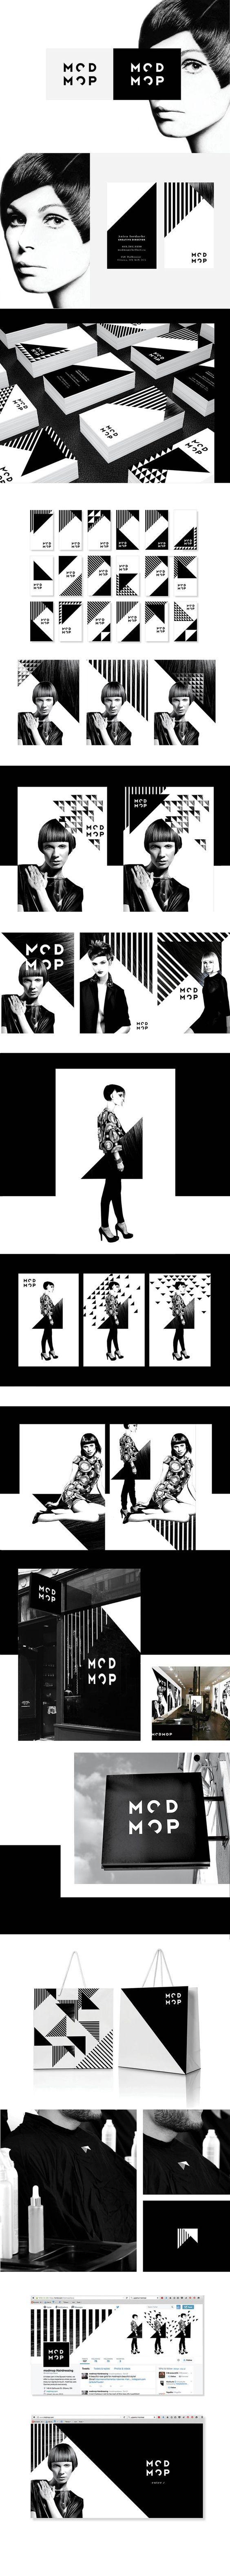 Modmop High-end Salon Branding by Alex Nereuta   Fivestar Branding Agency – Design and Branding Agency & Curated Inspiration Gallery